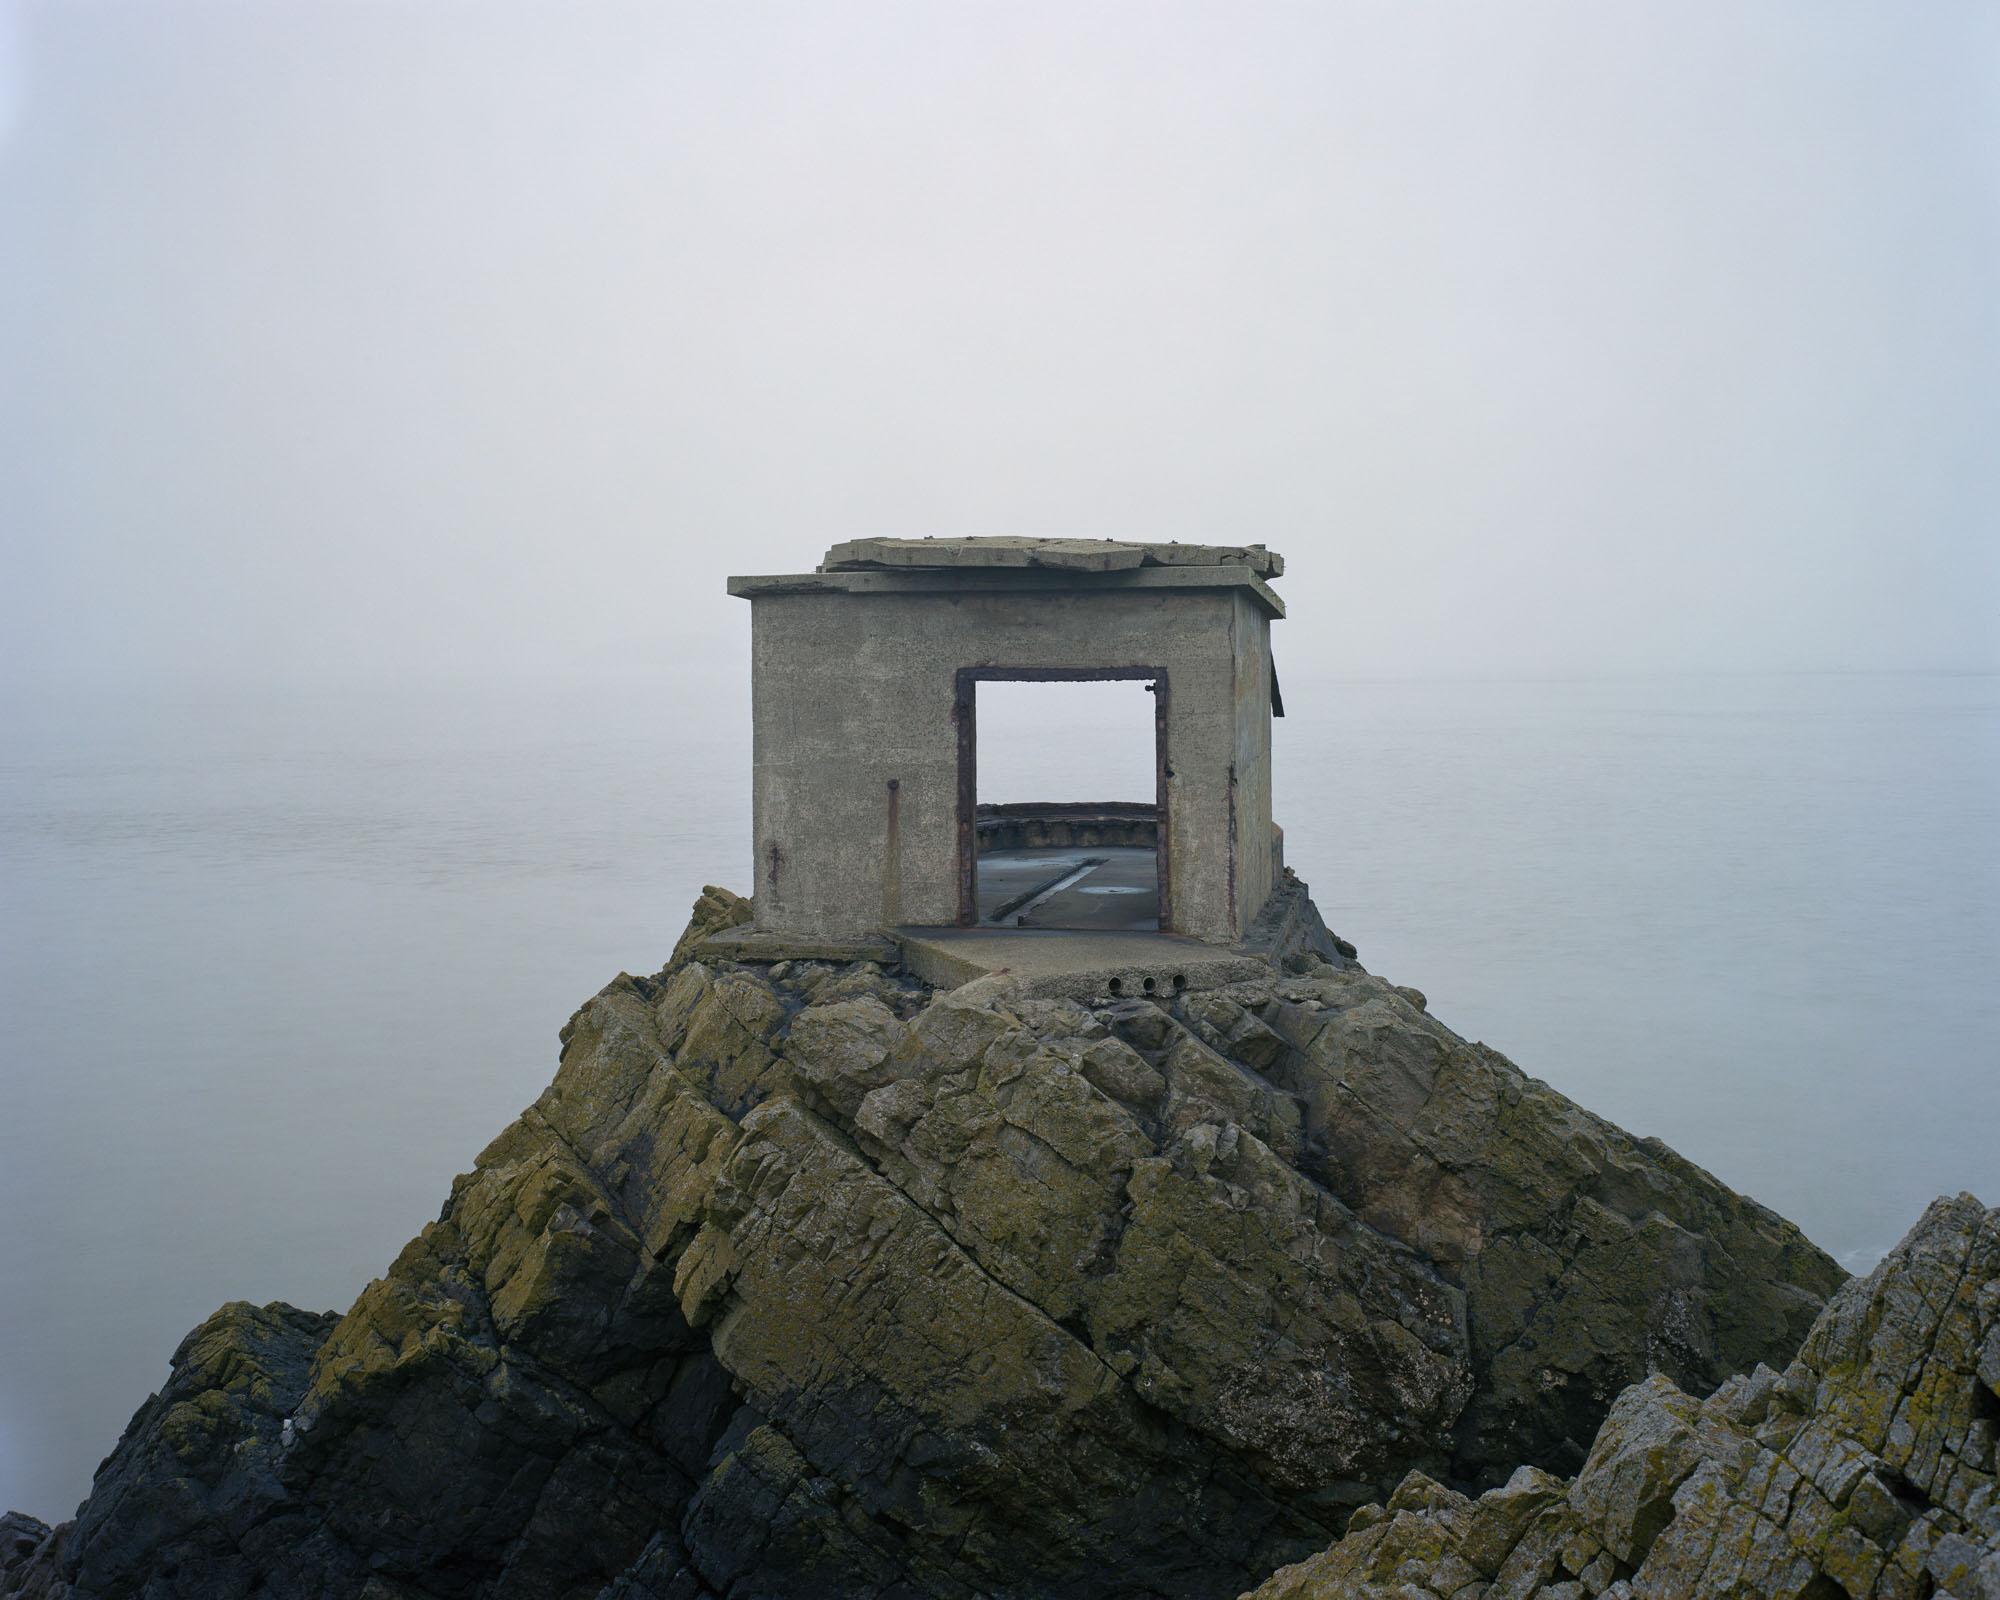 landscape photographer | Marc Wilson | Last Stand | Personal Work Journal